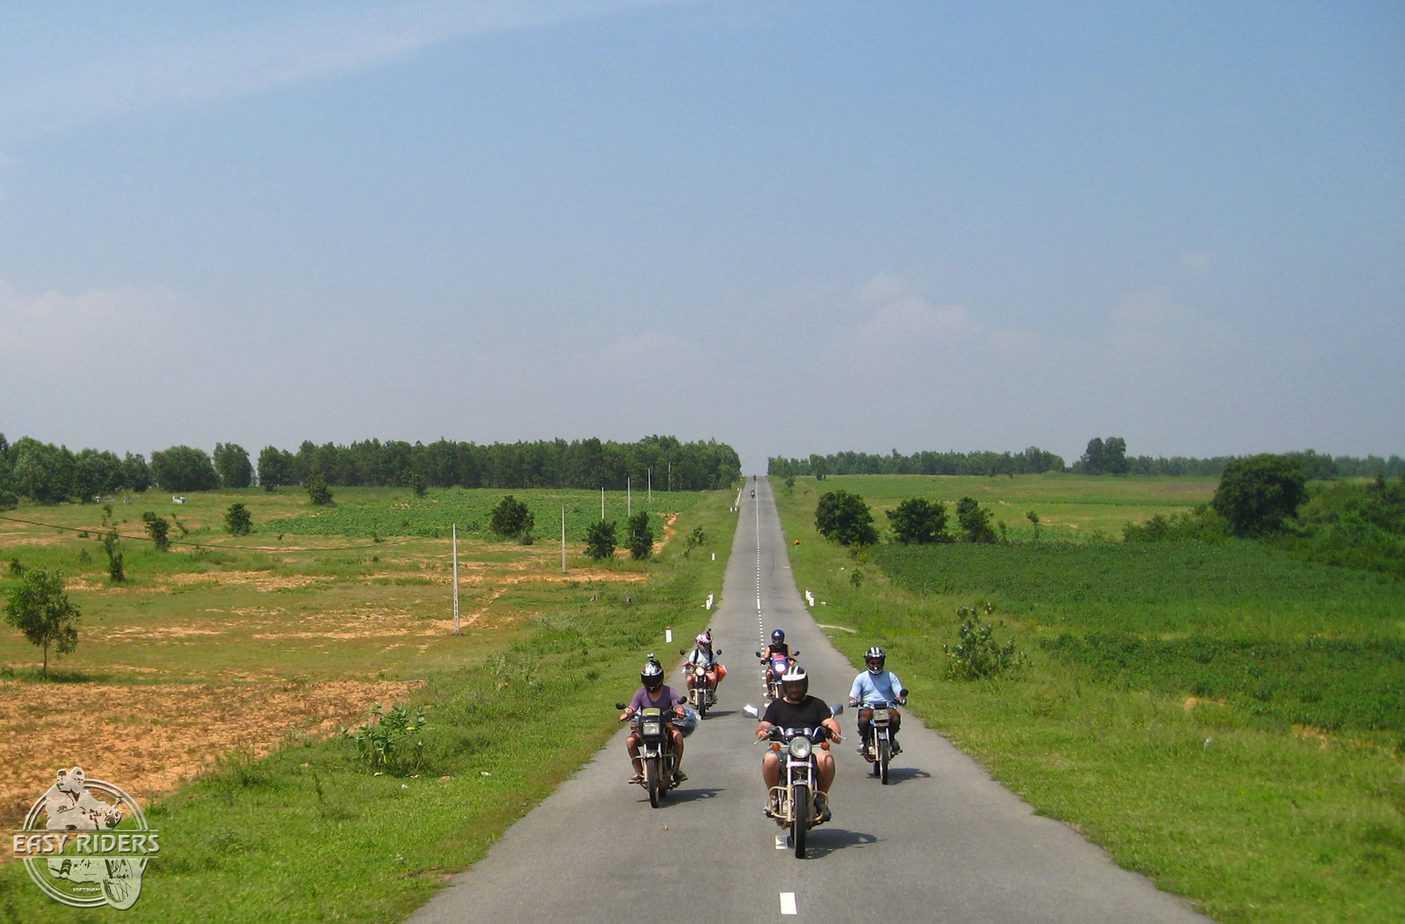 Easy Riders Vietnam Saigon to Hoi An